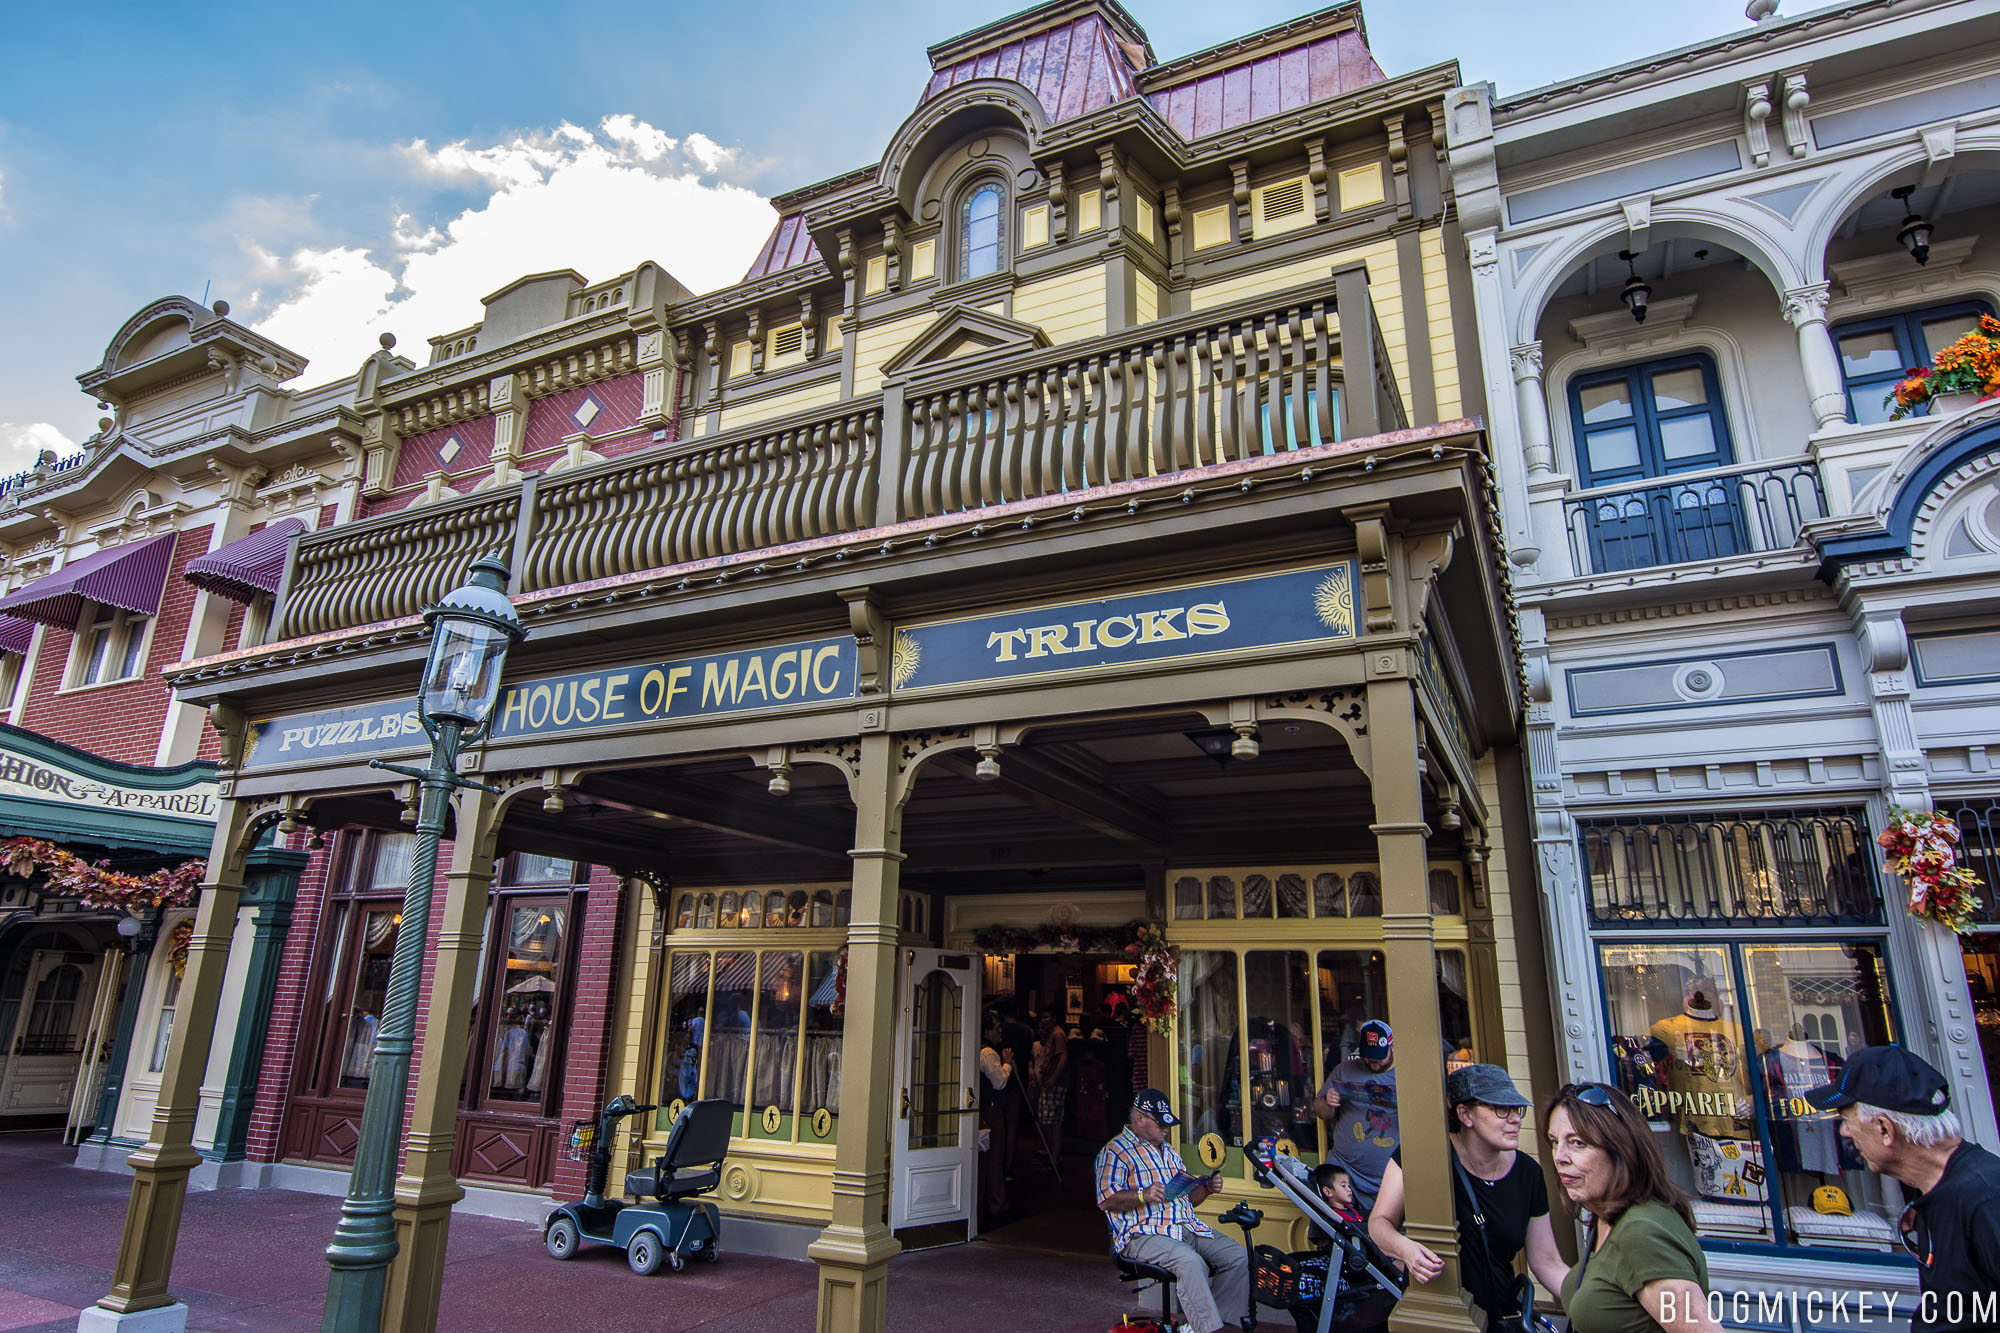 PHOTOS: House Of Magic Facade Returns To Main Street USA